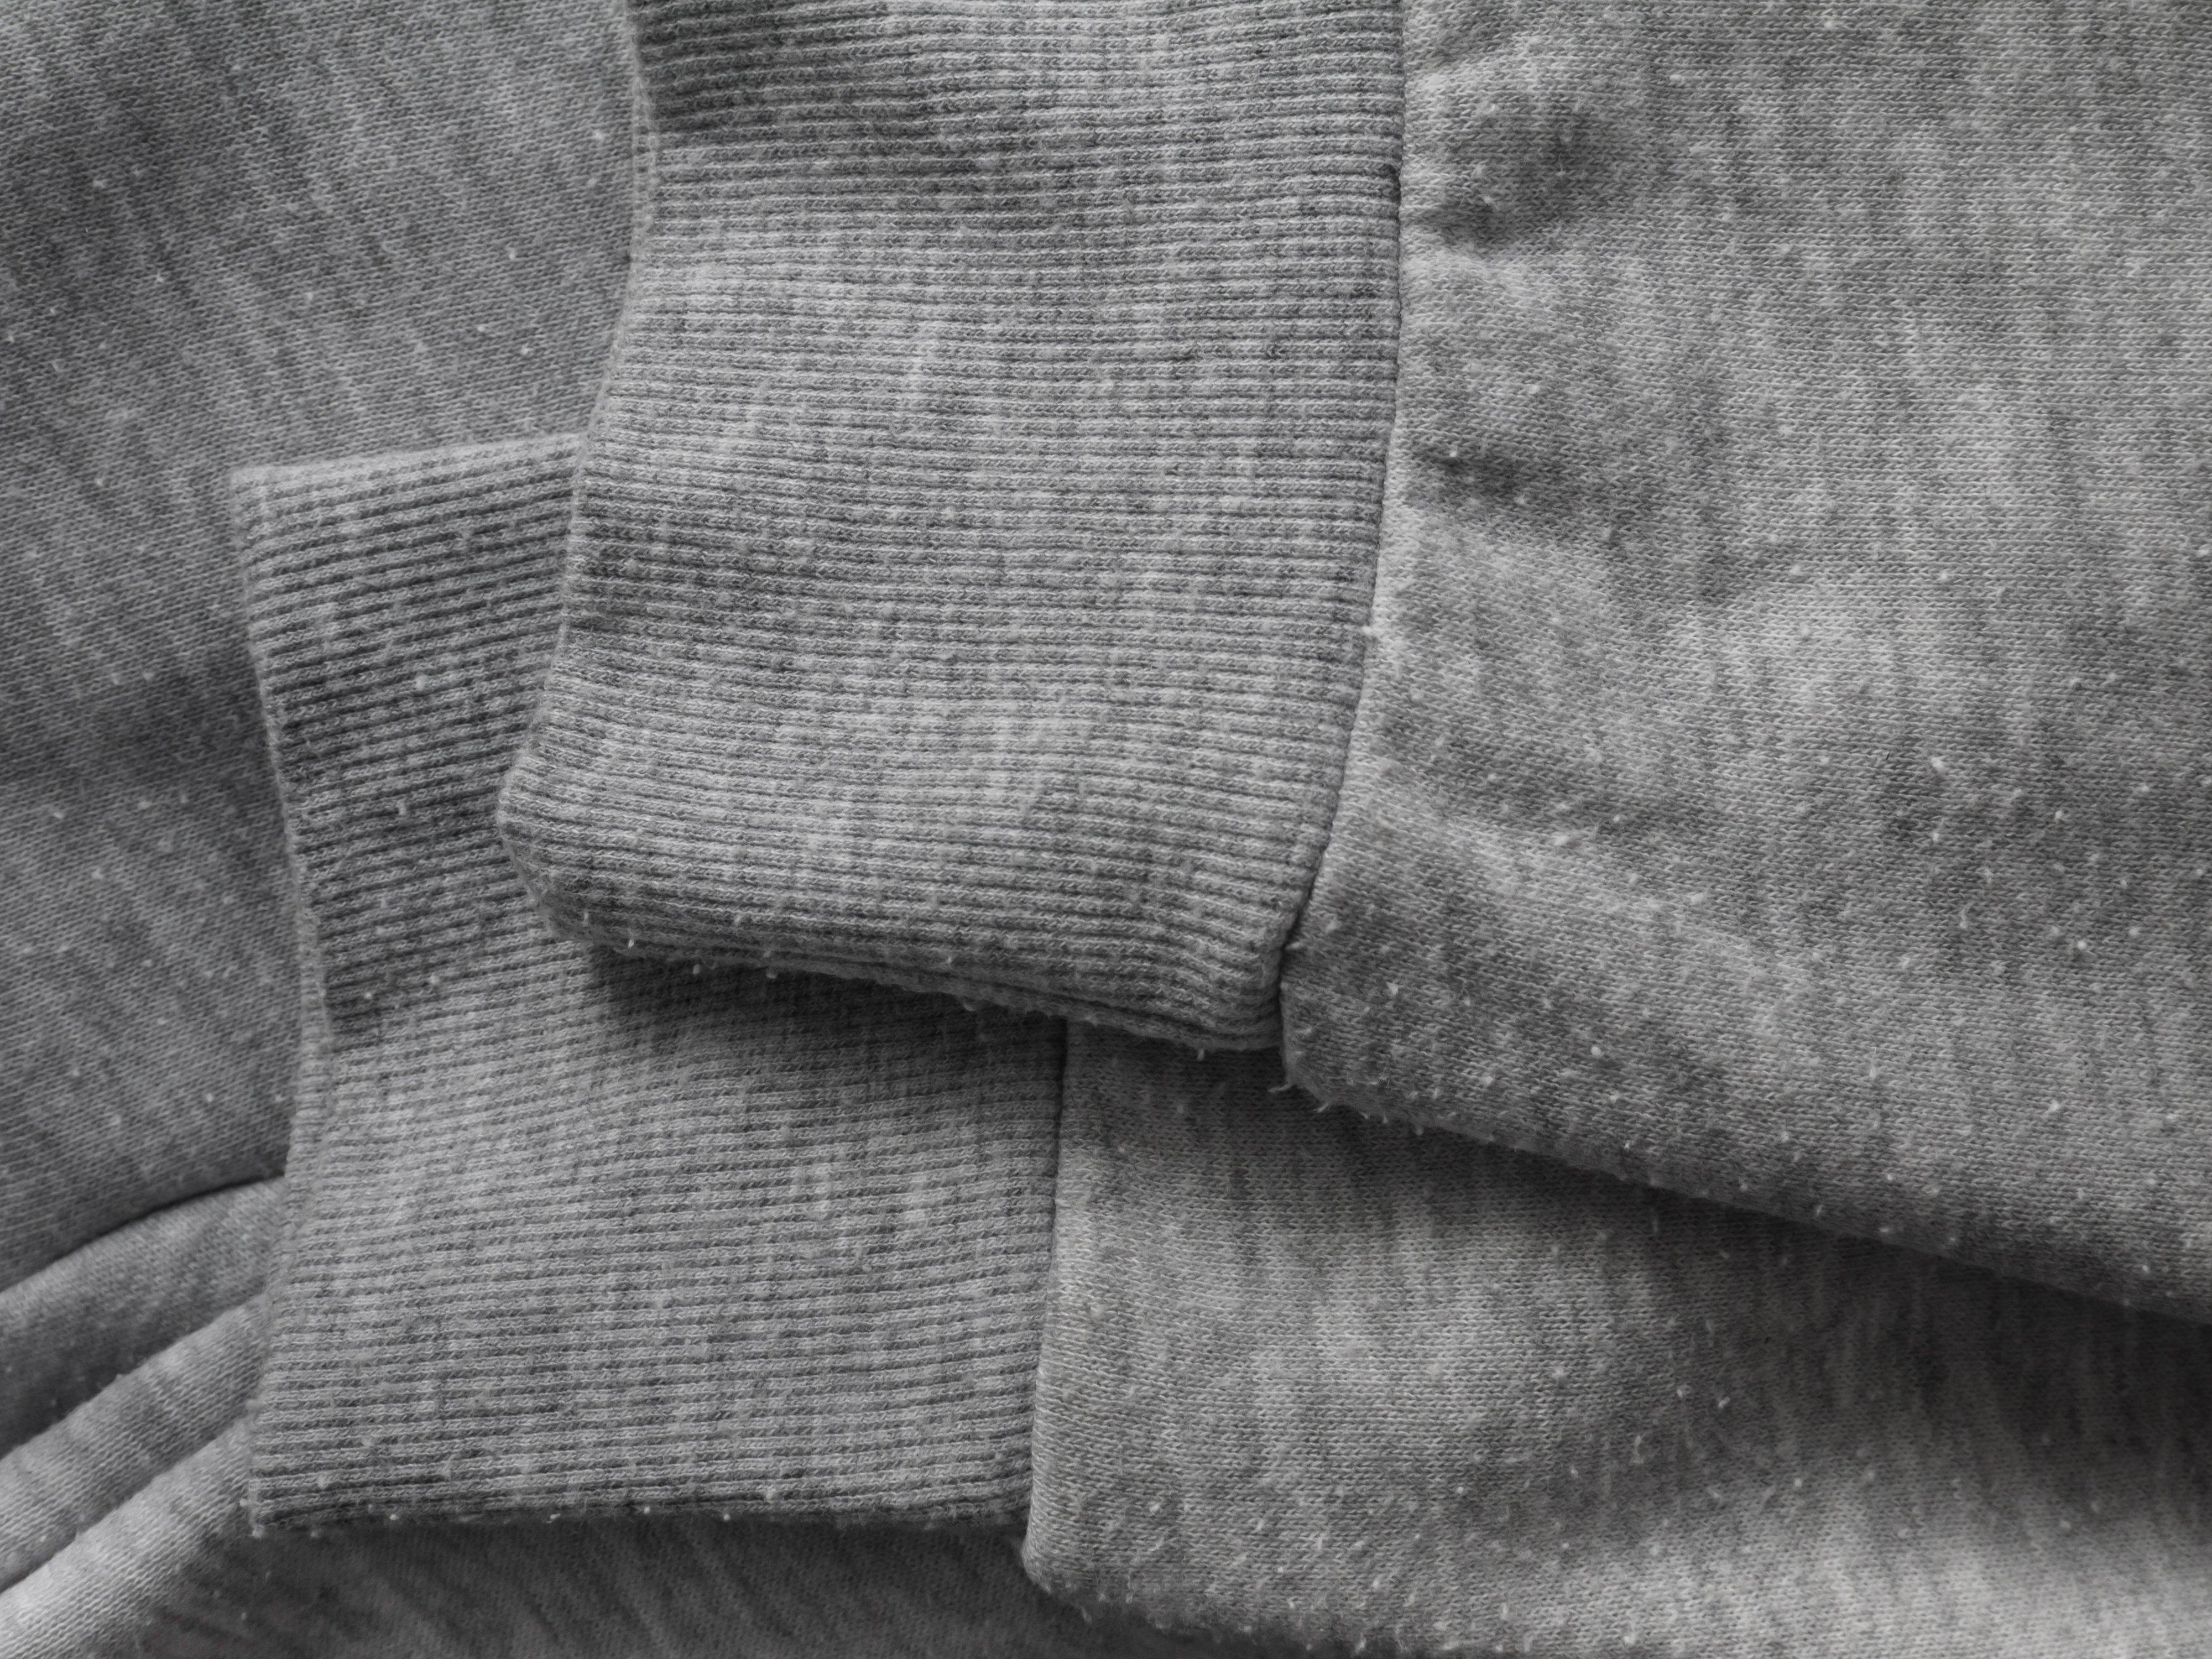 Canva - Pills on the heather gray sweatshirt cotton knit fabric